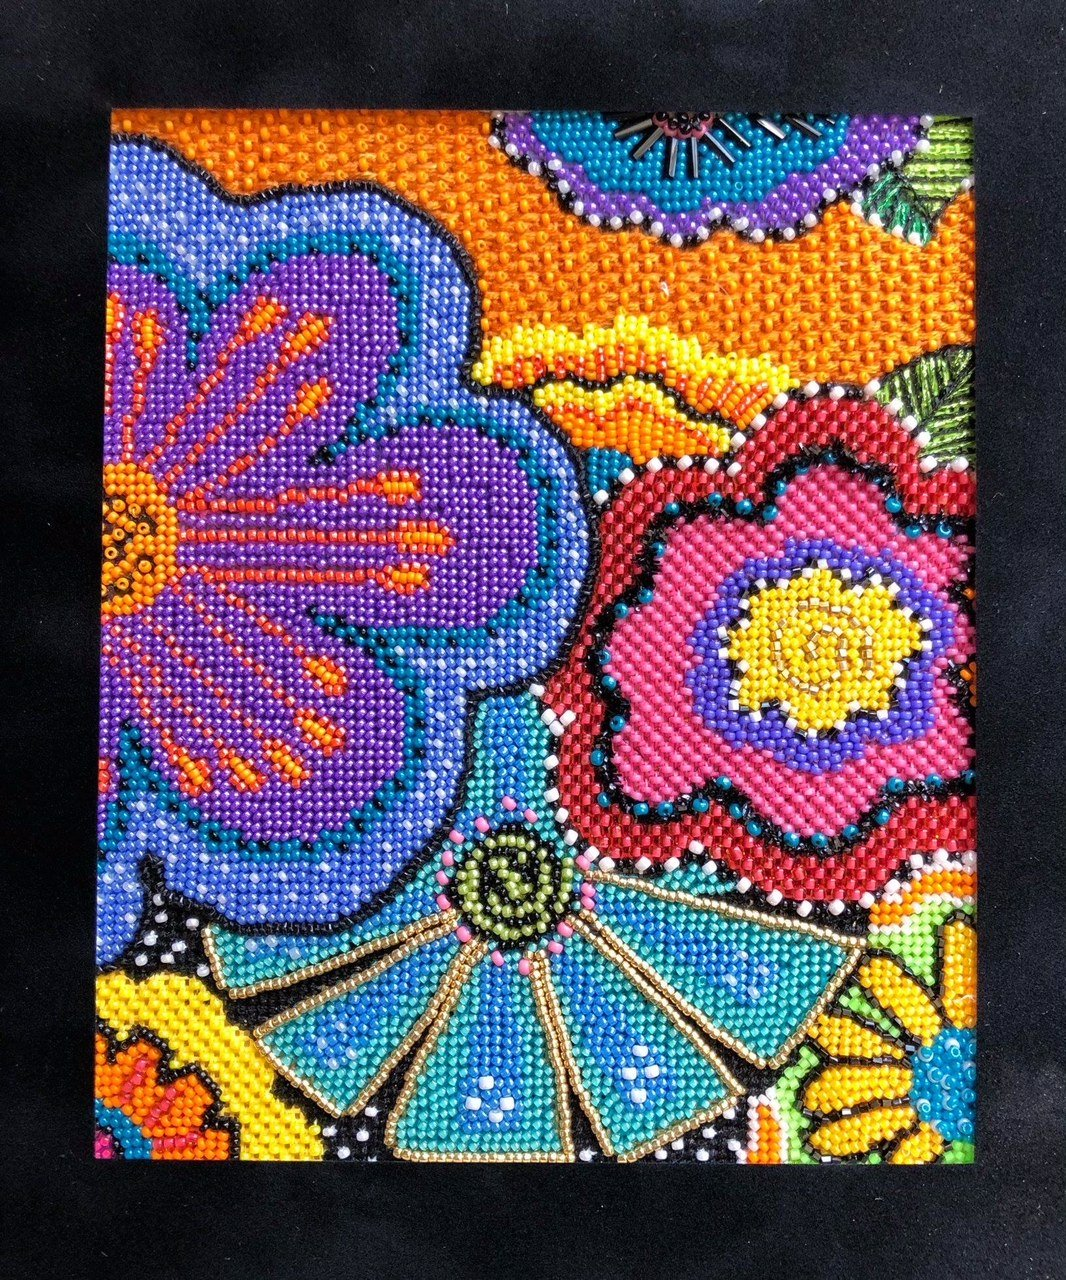 Southwestern Needlepoint | Scottsdale Cross Stitch Shop